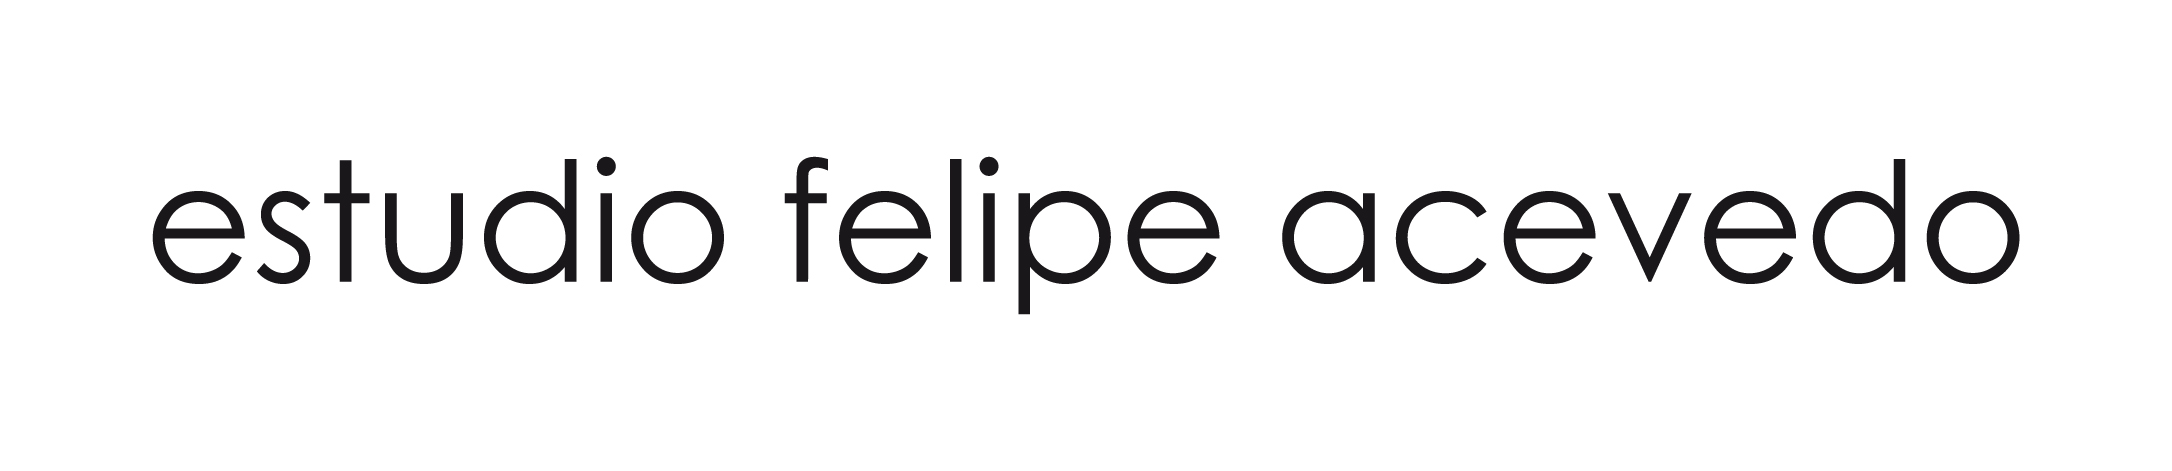 Logotipo del Estudio Felipe Acevedo